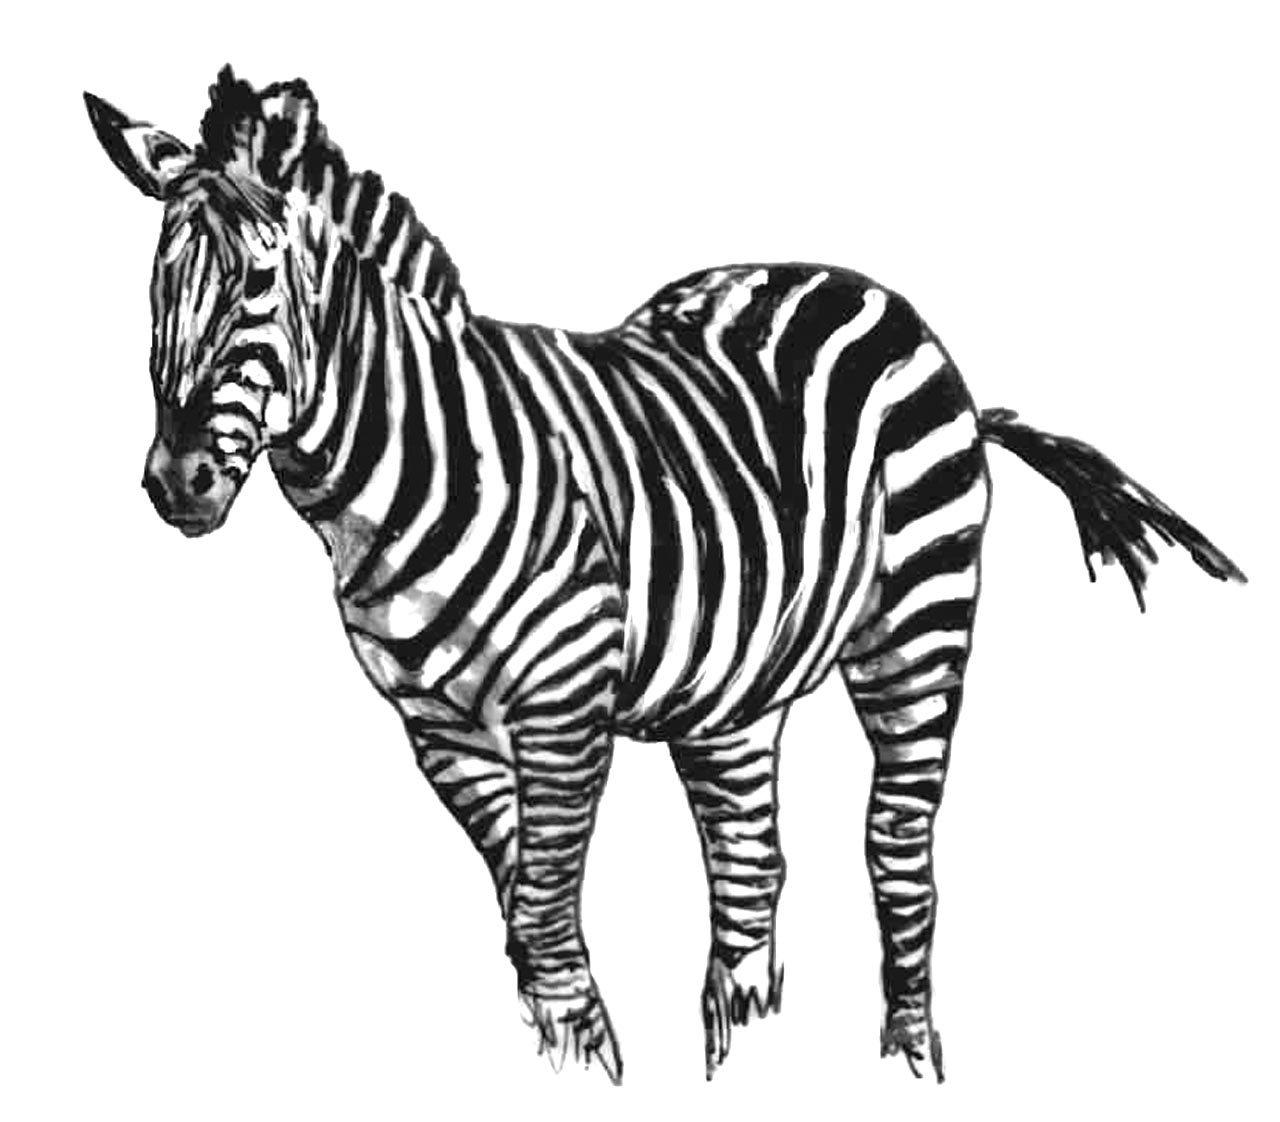 Dessin zebre dessin gratuit - Zebre a dessiner ...